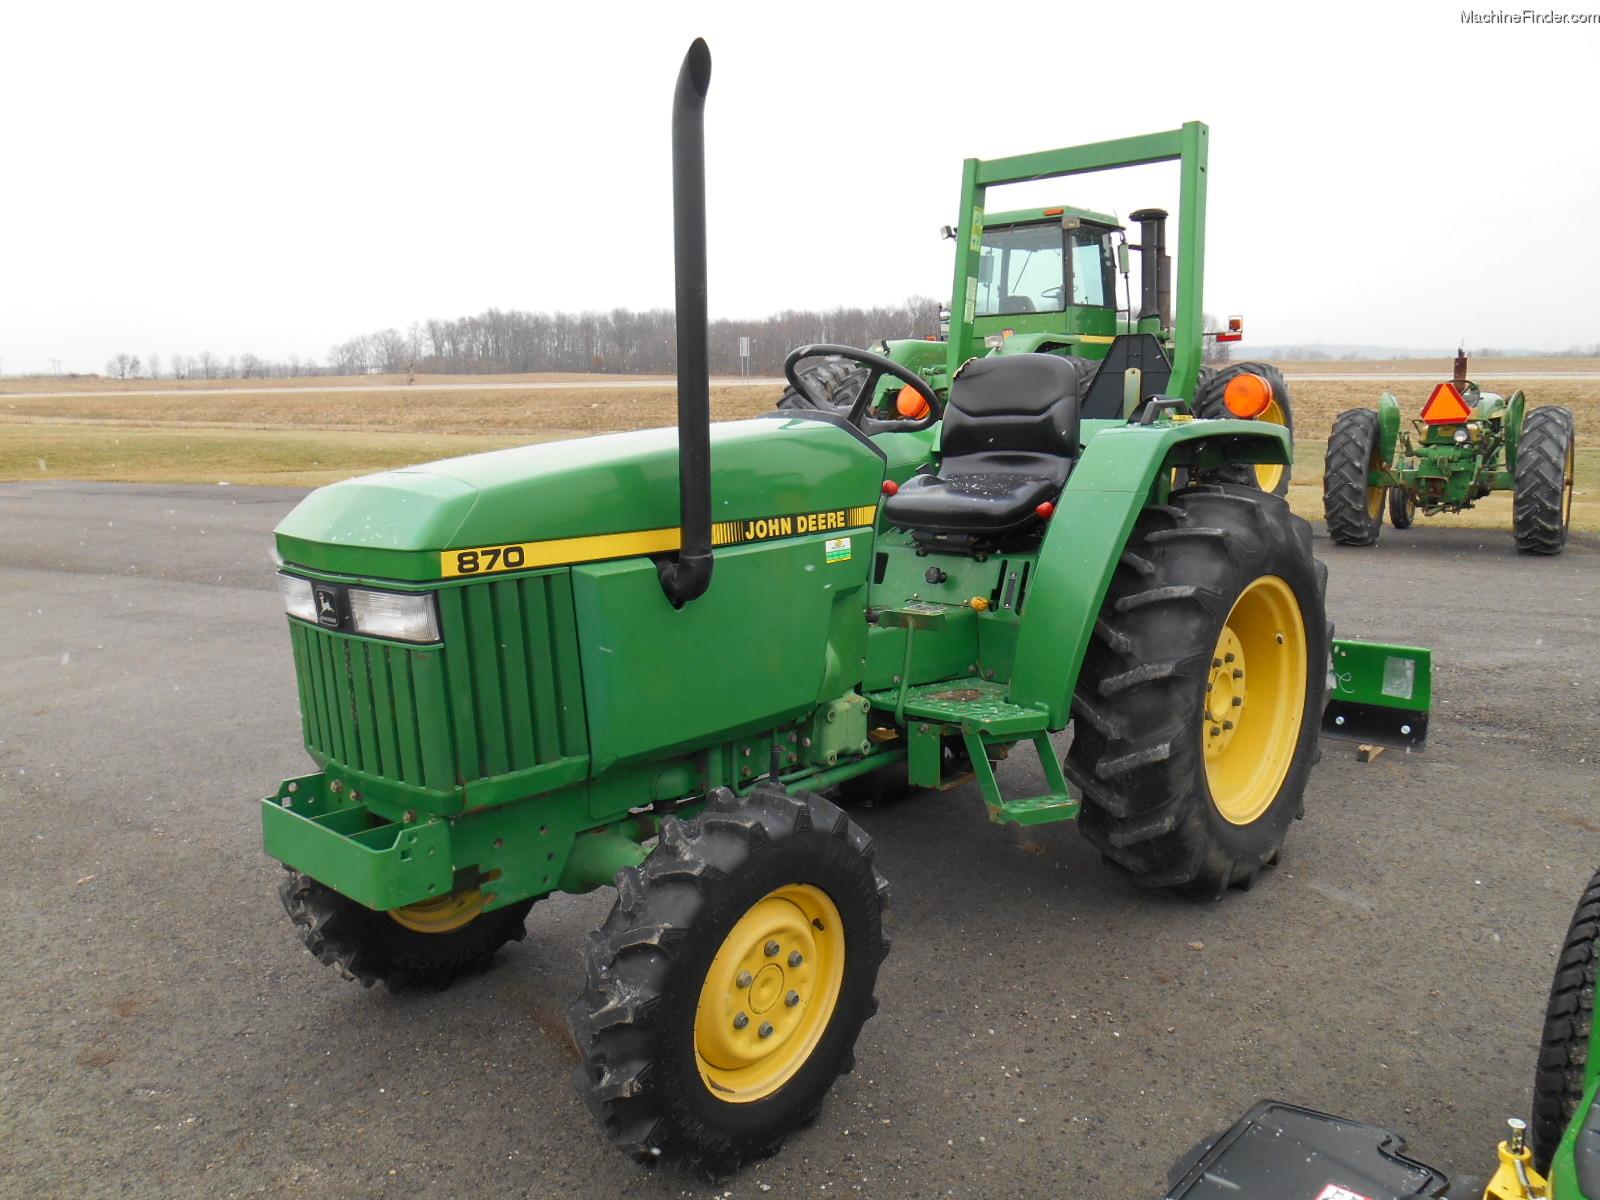 1991 John Deere 870 Tractors - Compact (1-40hp.) - John ...